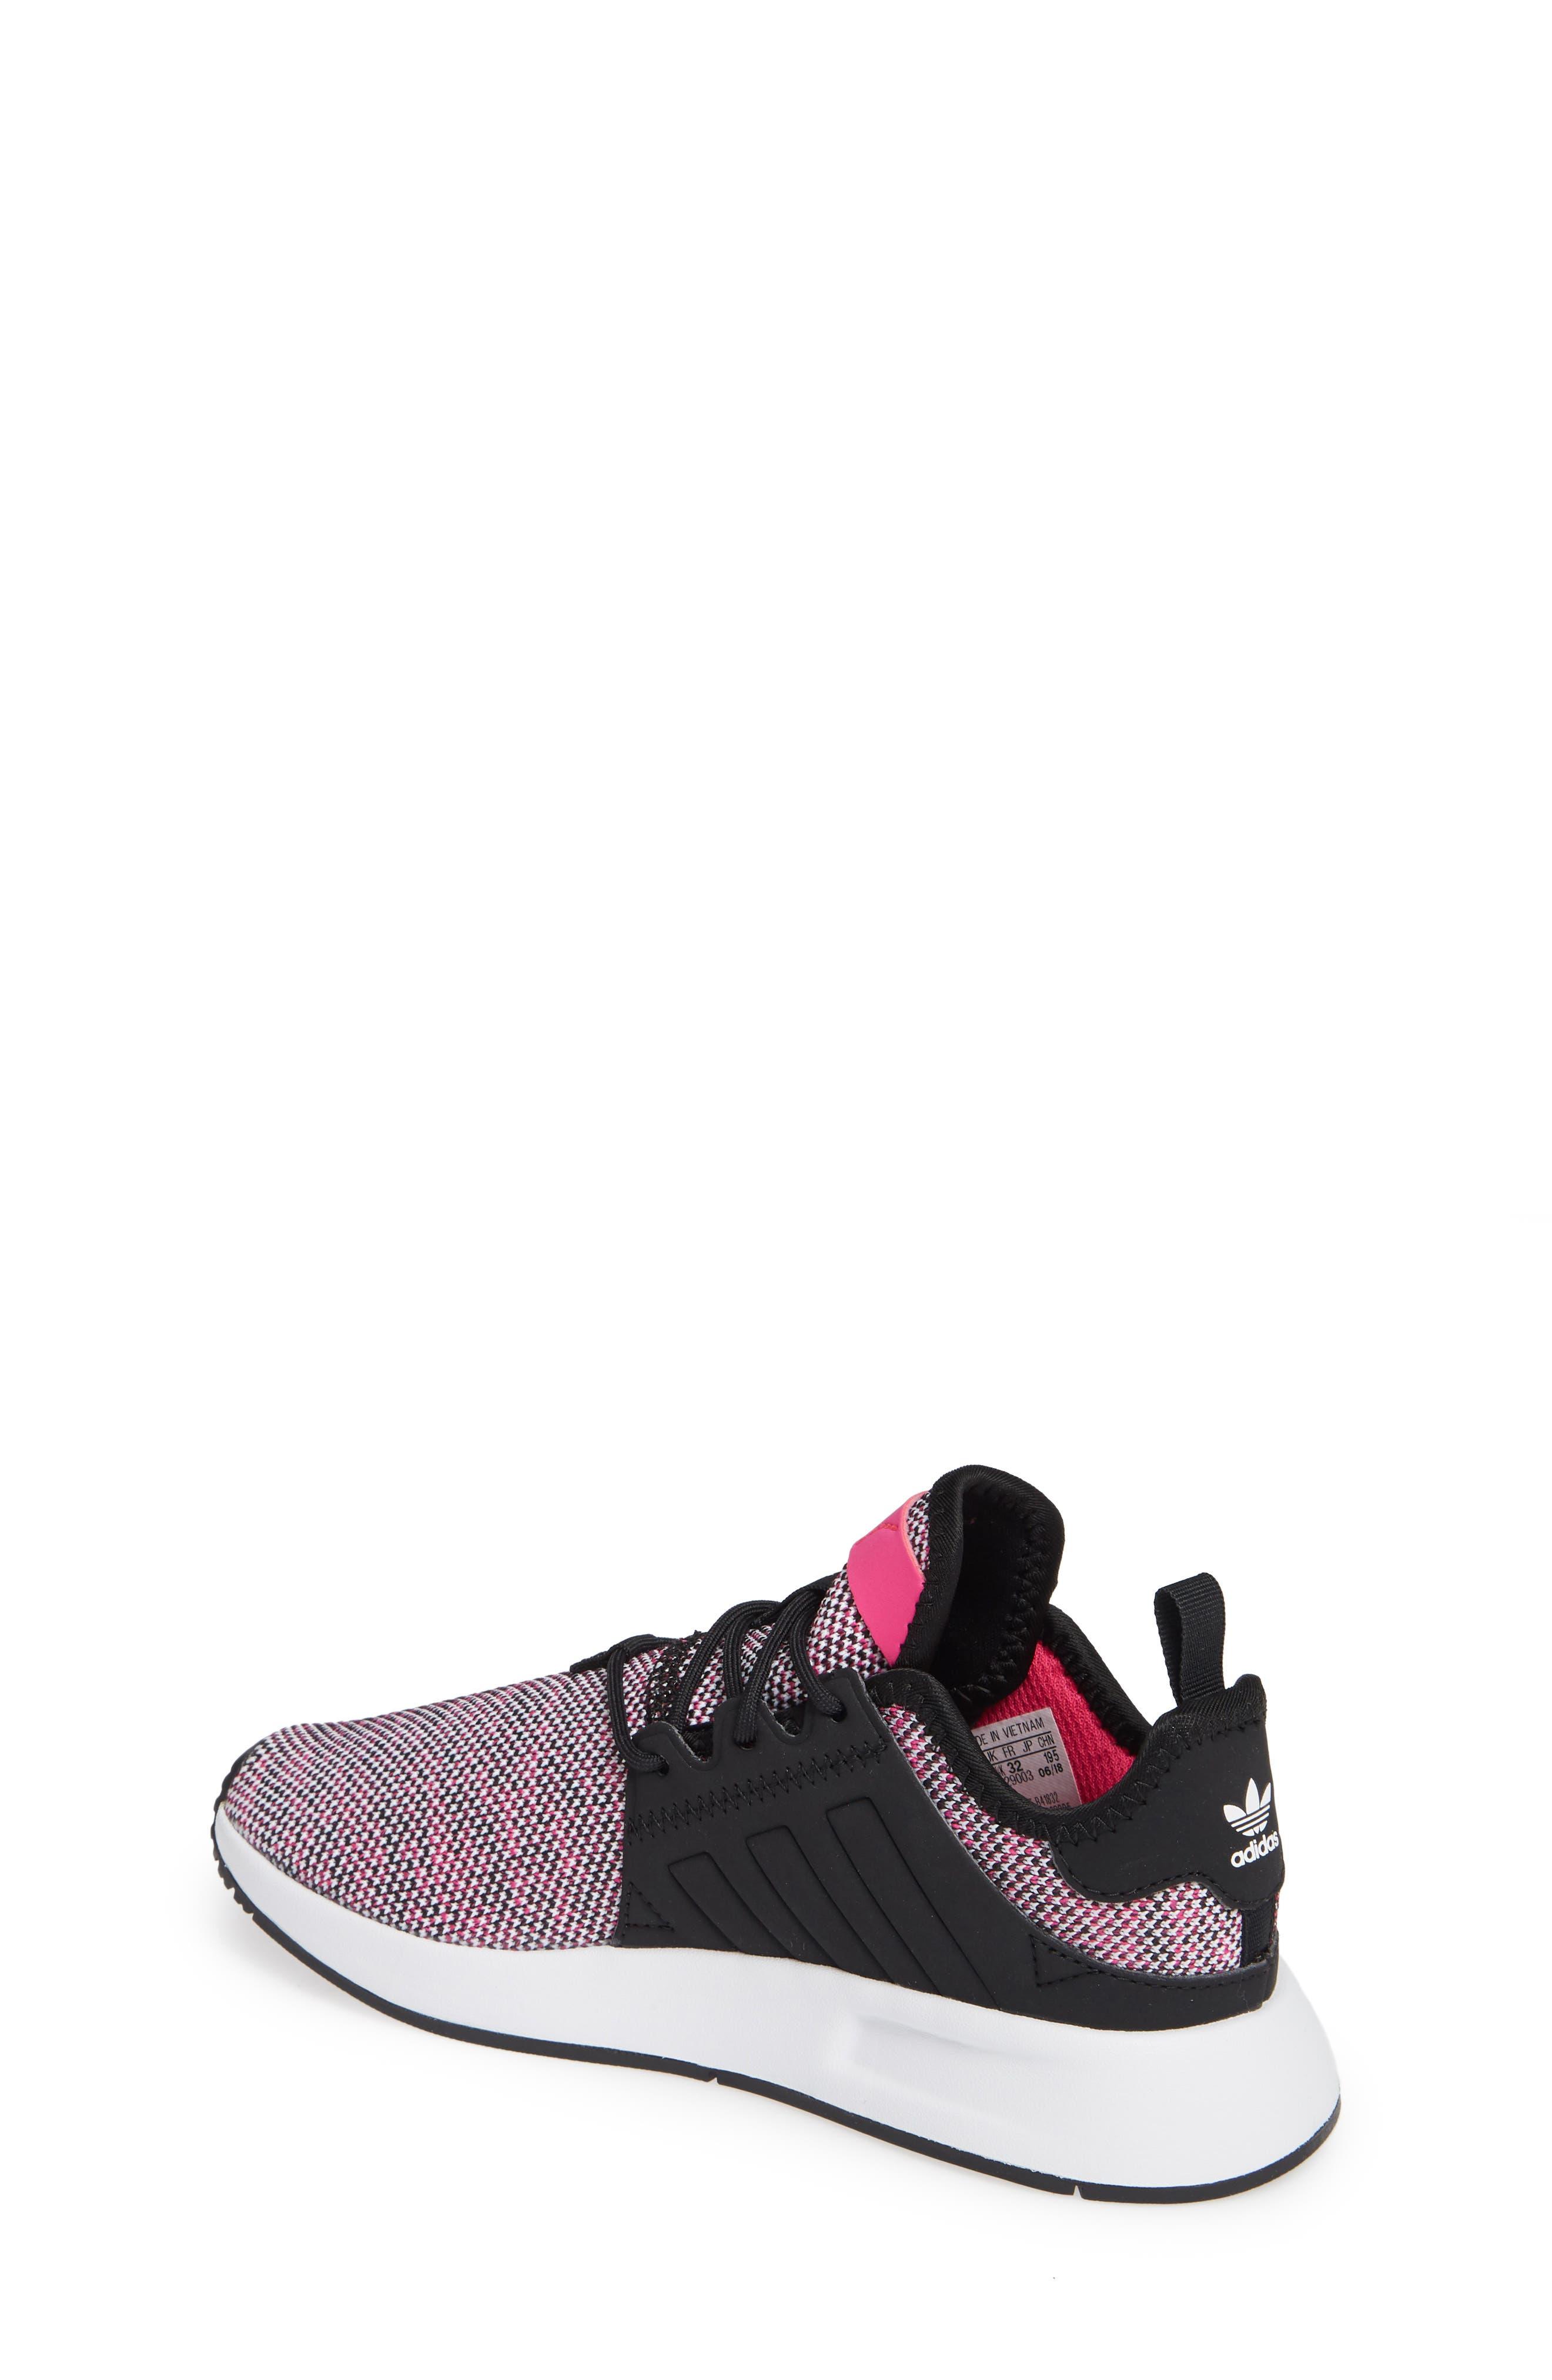 X_PLR Sneaker,                             Alternate thumbnail 2, color,                             Shock Pink/ Black/ White